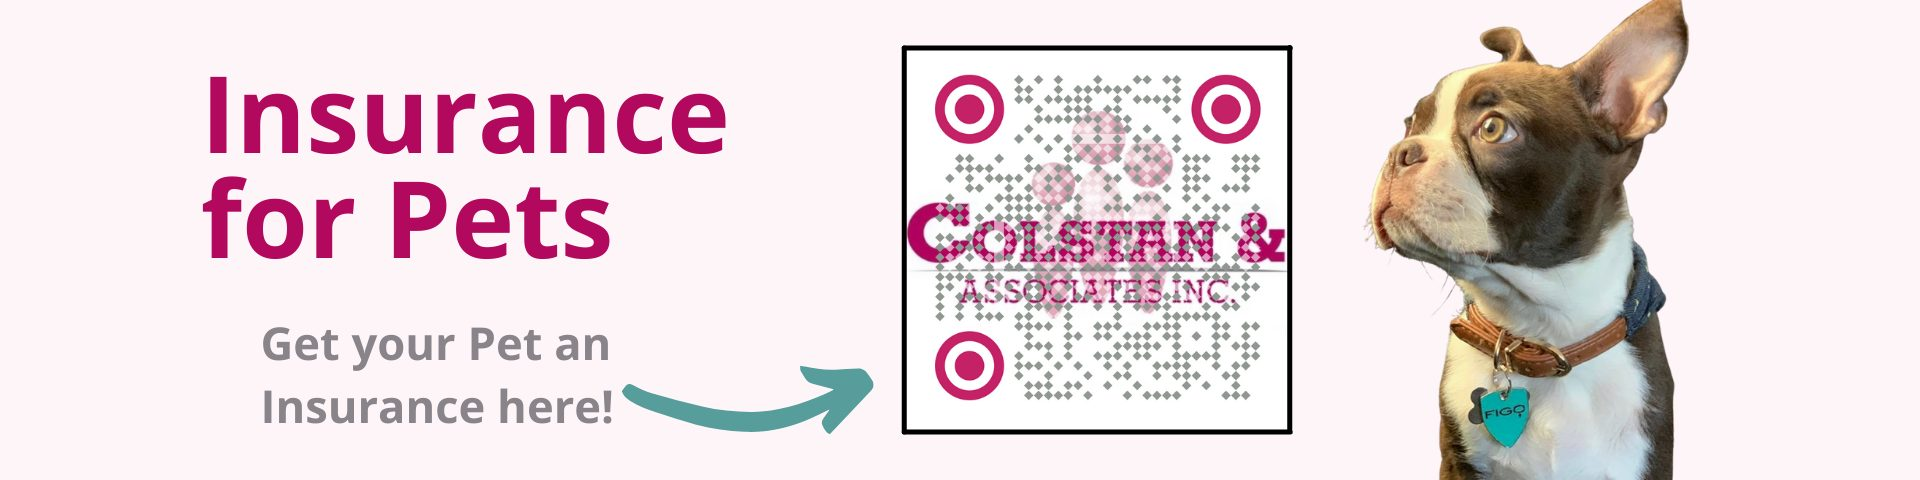 colstan & associates inc - Insurance for pets 1 - Colstan & Associates Inc